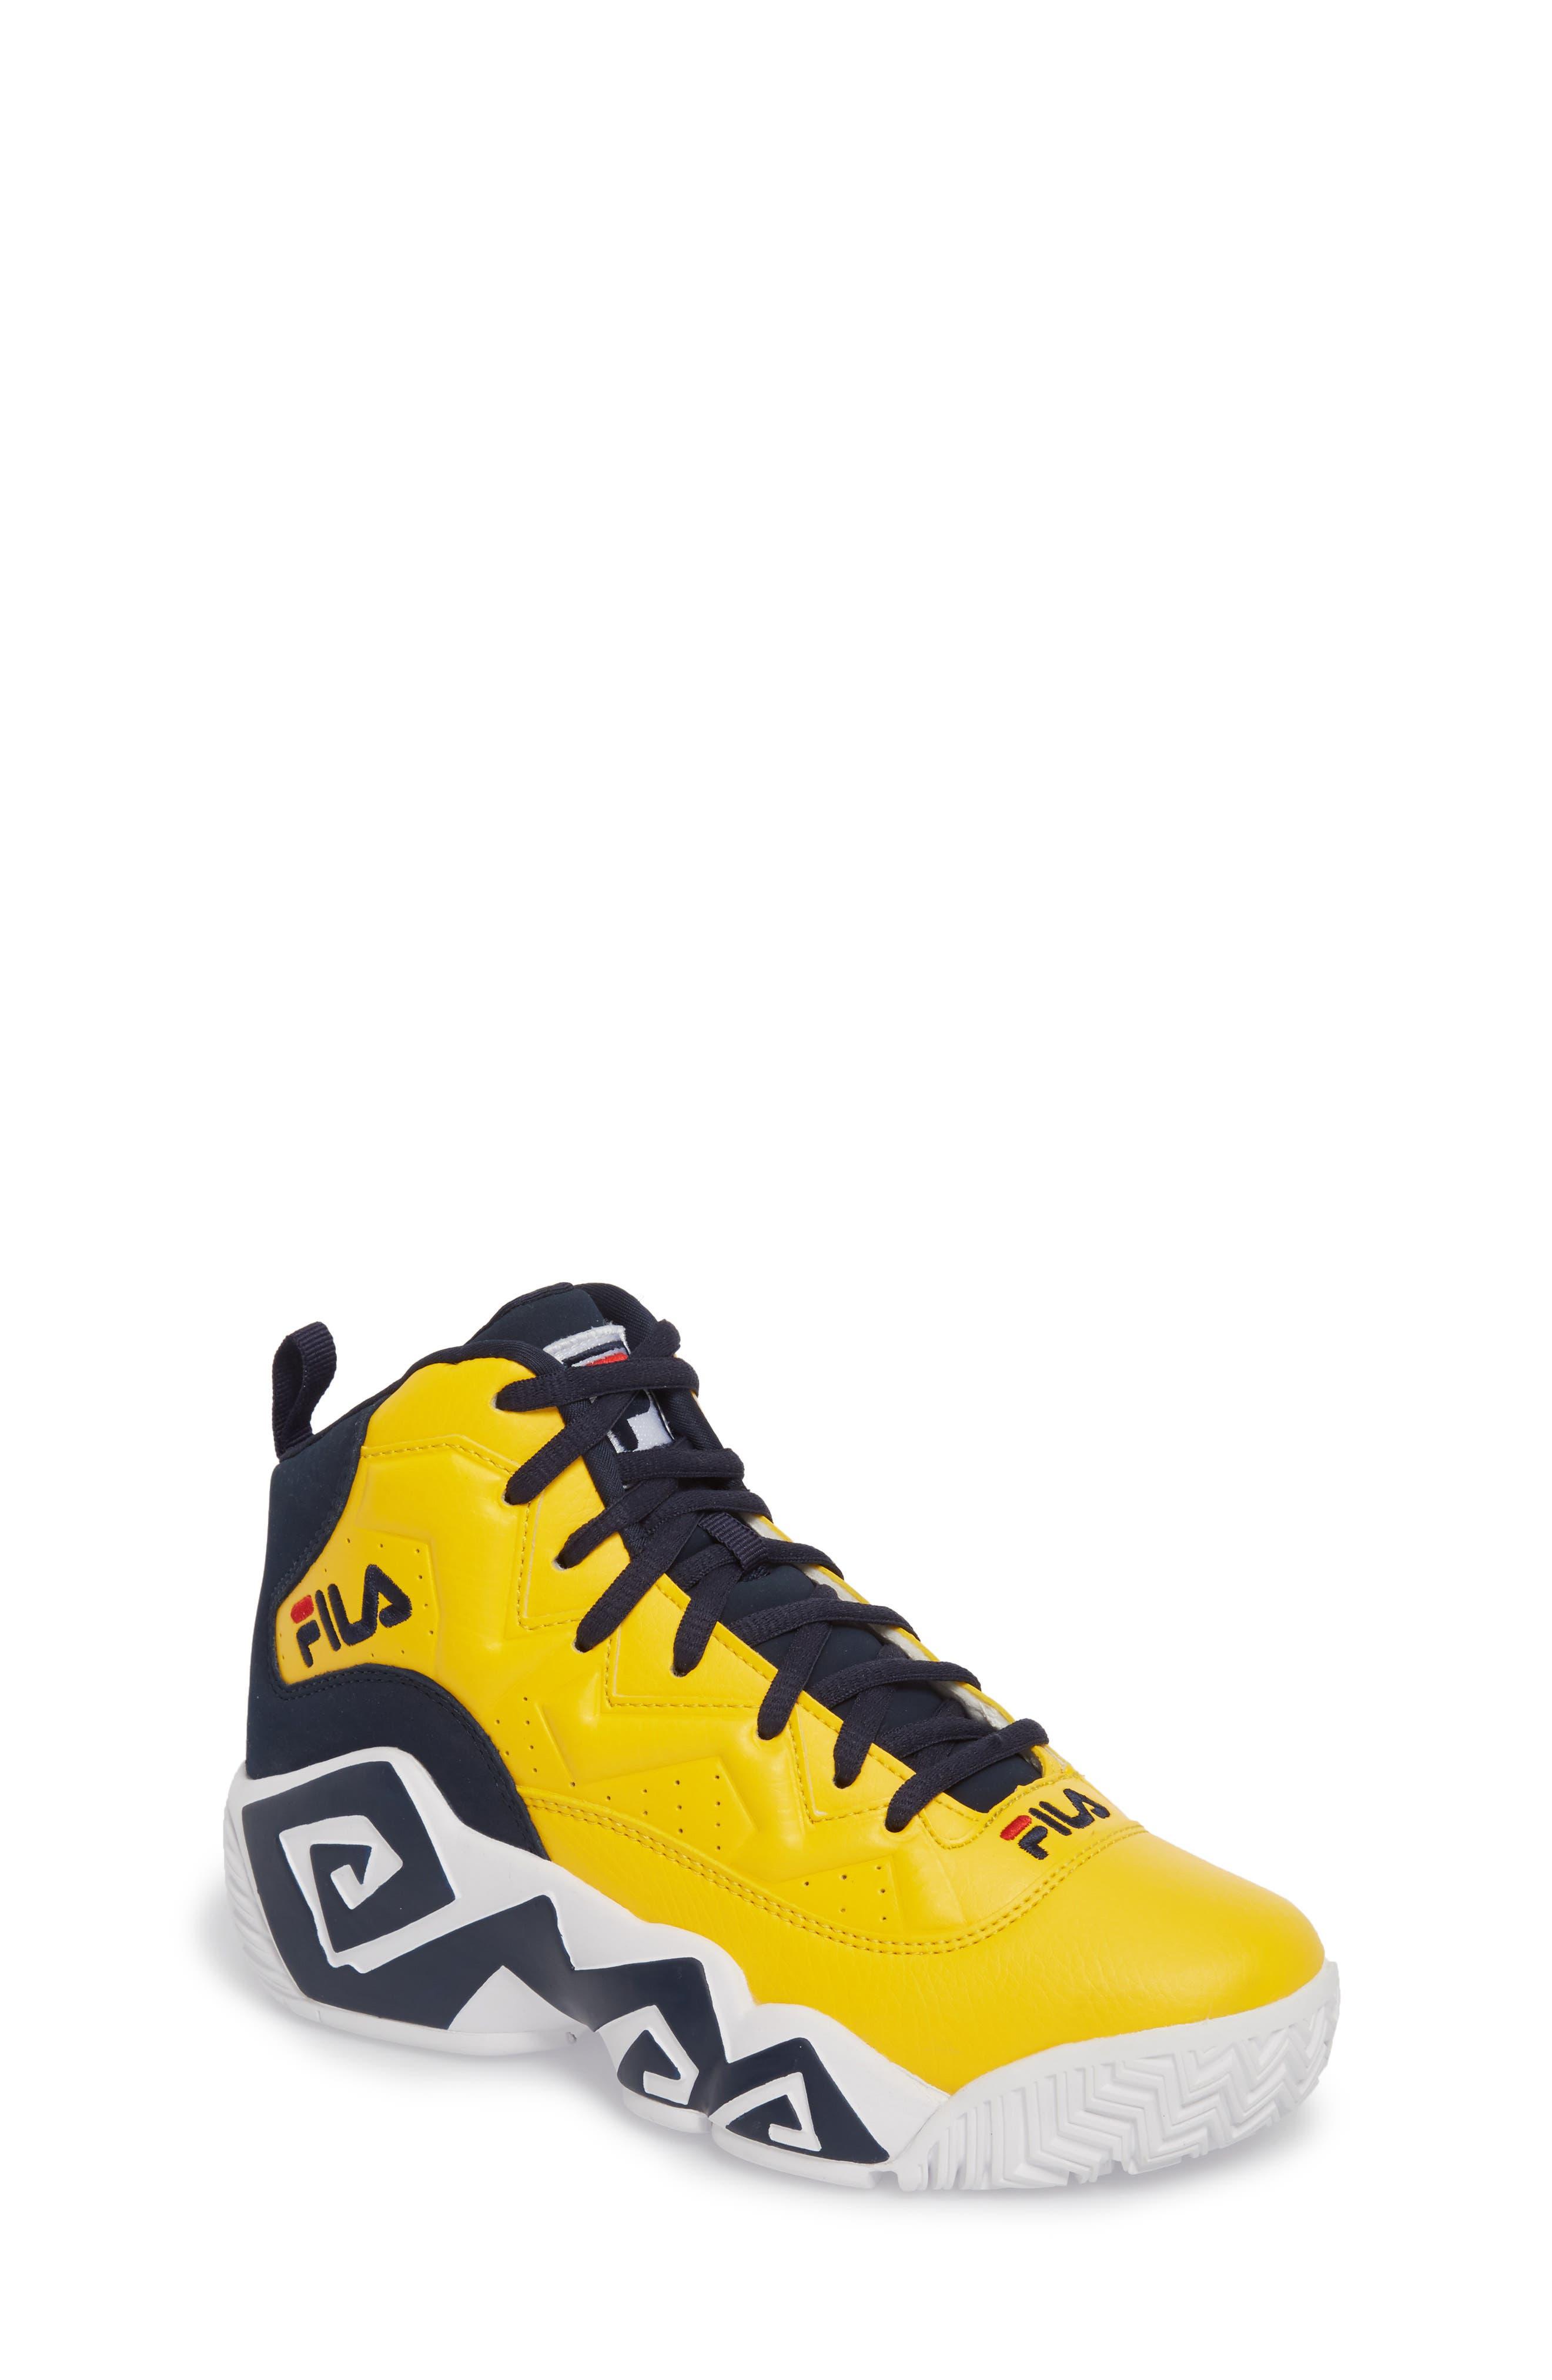 FILA MB High Top Sneaker (Big Kid)